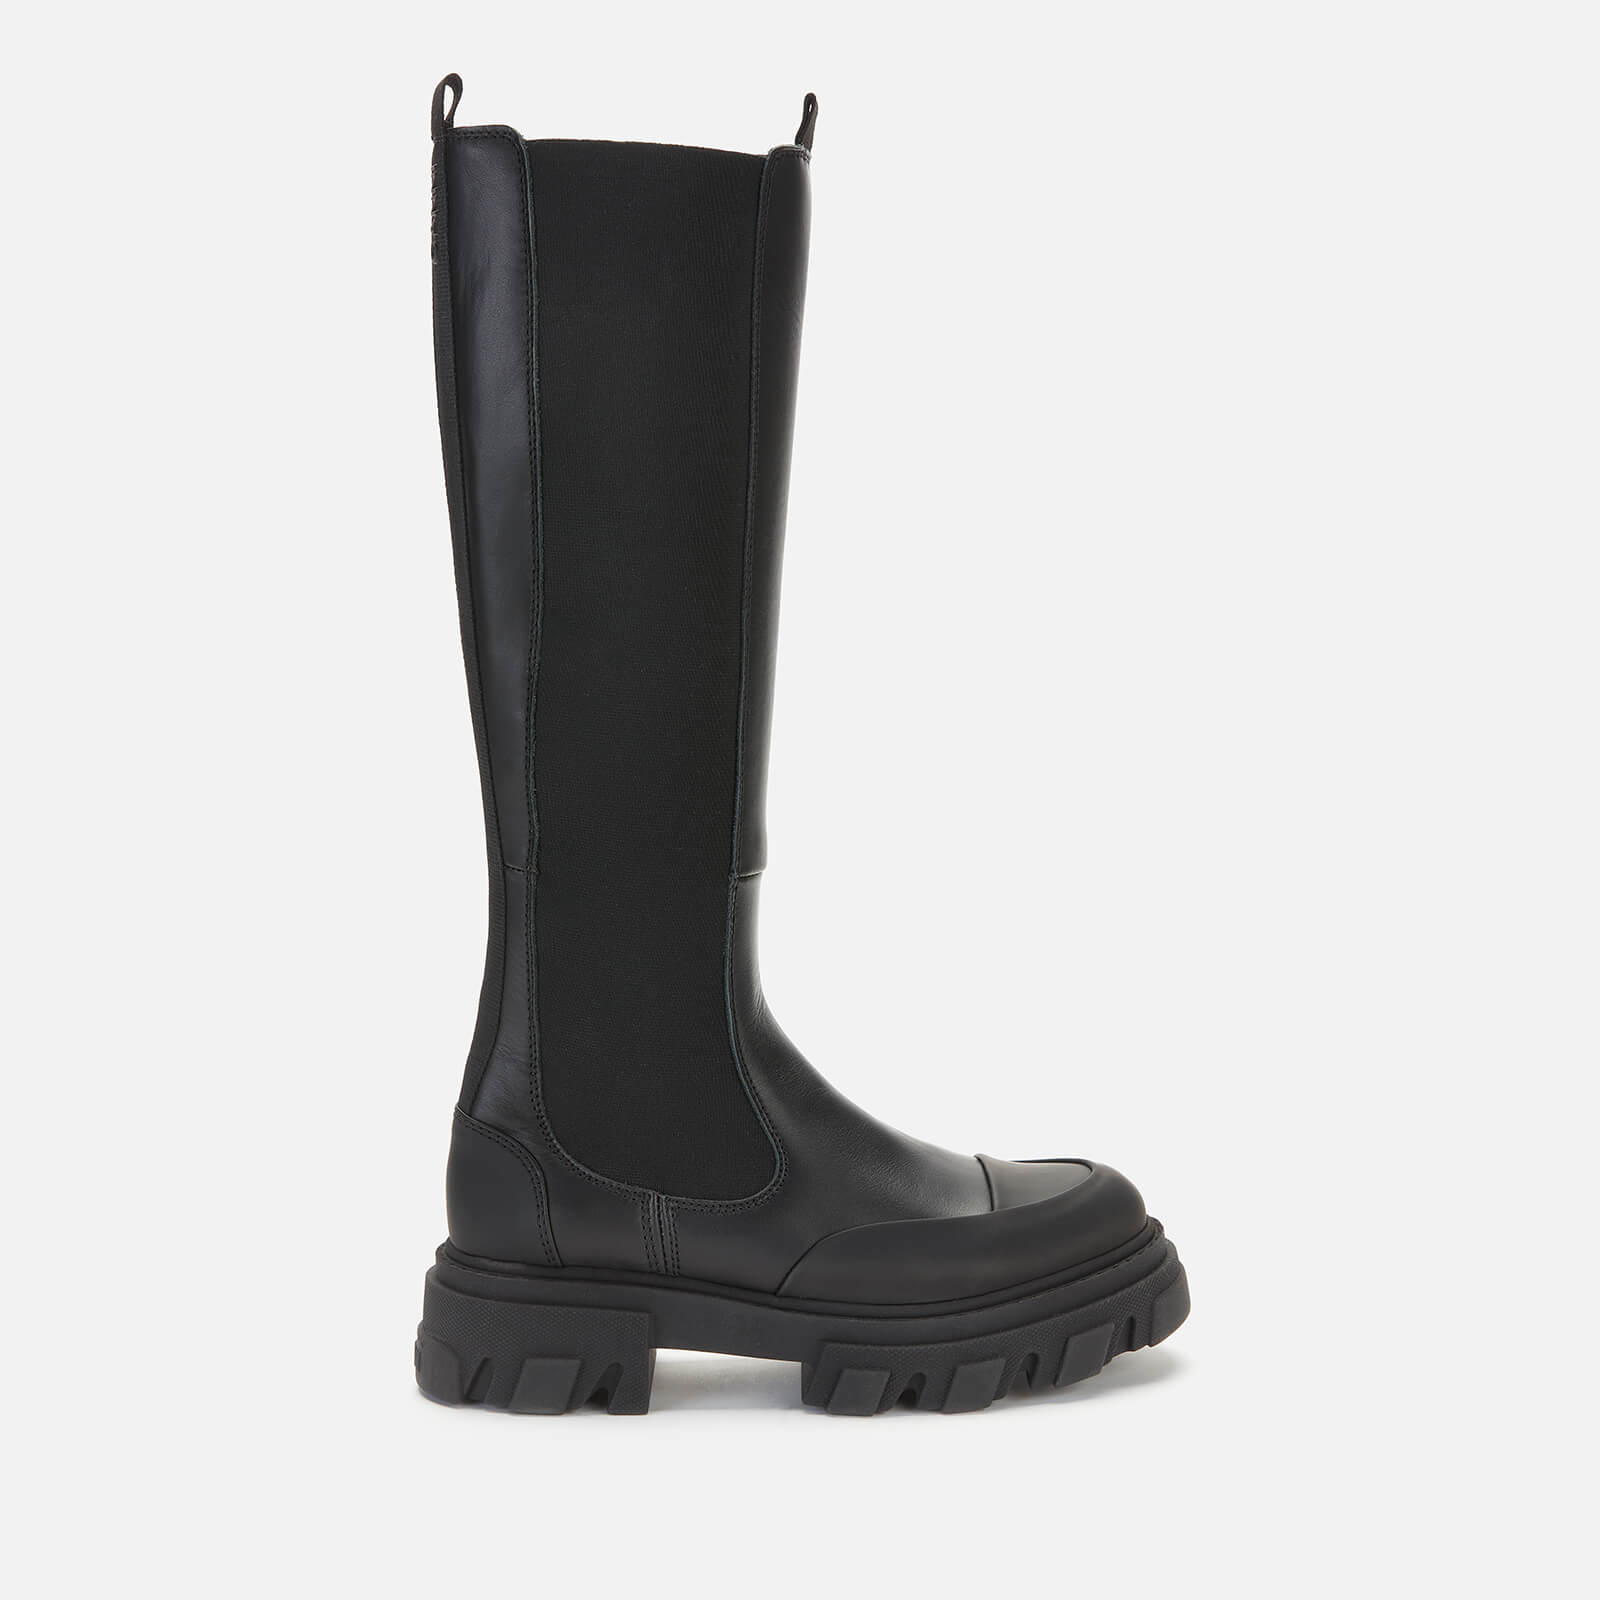 Ganni Women's Knee High Leather Chelsea Boots - Black - Uk 3